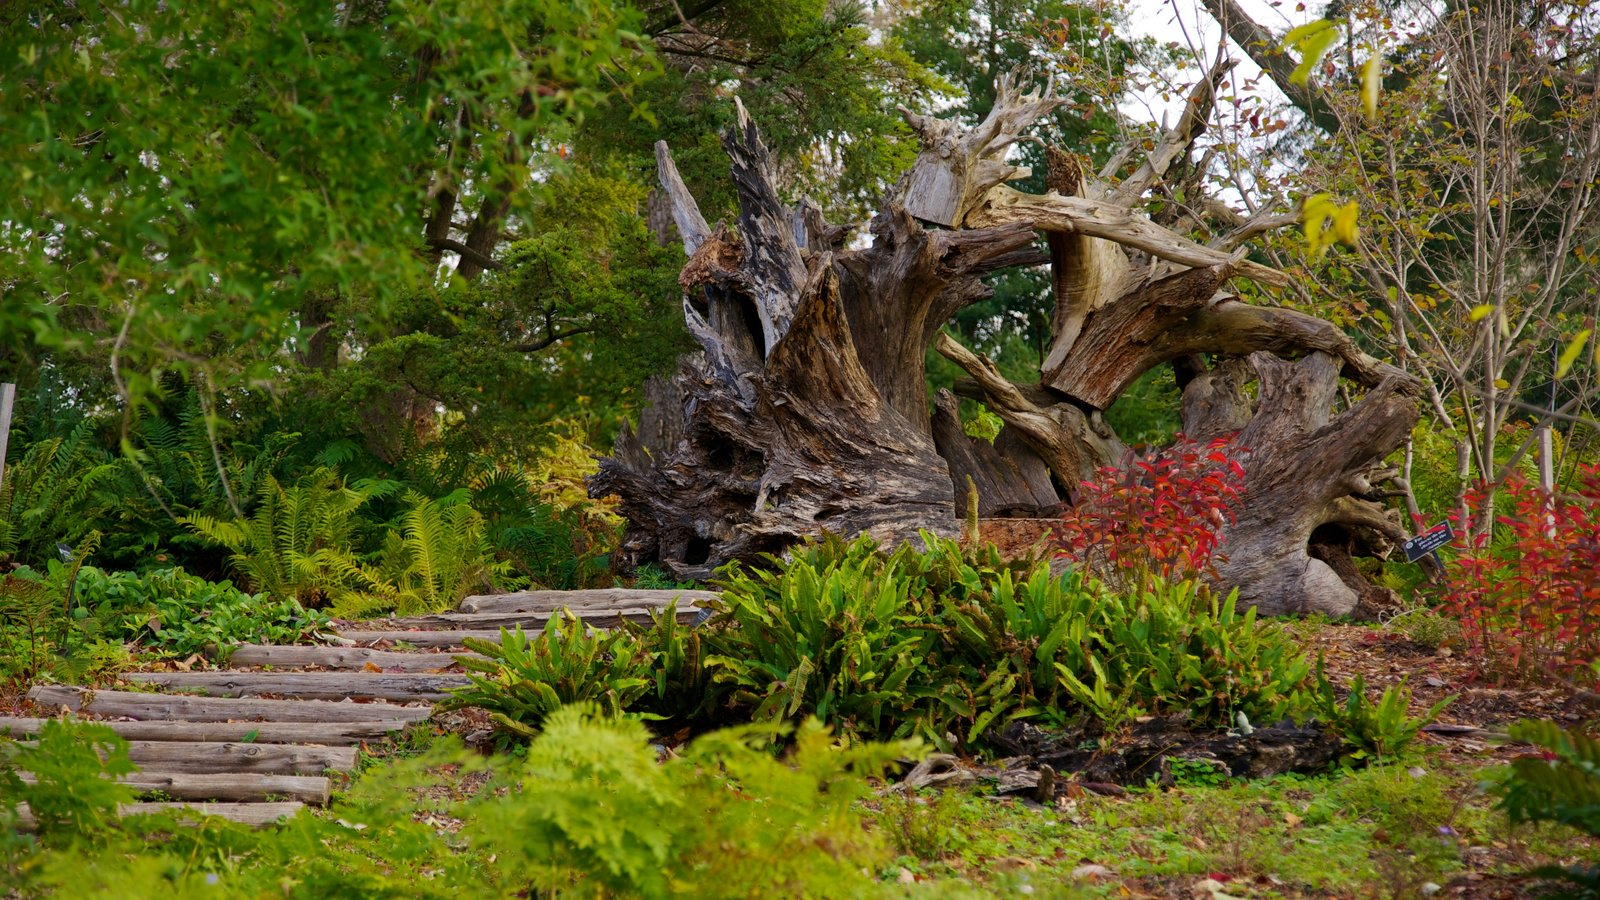 Morris Arboretum caracterizando um parque e paisagem